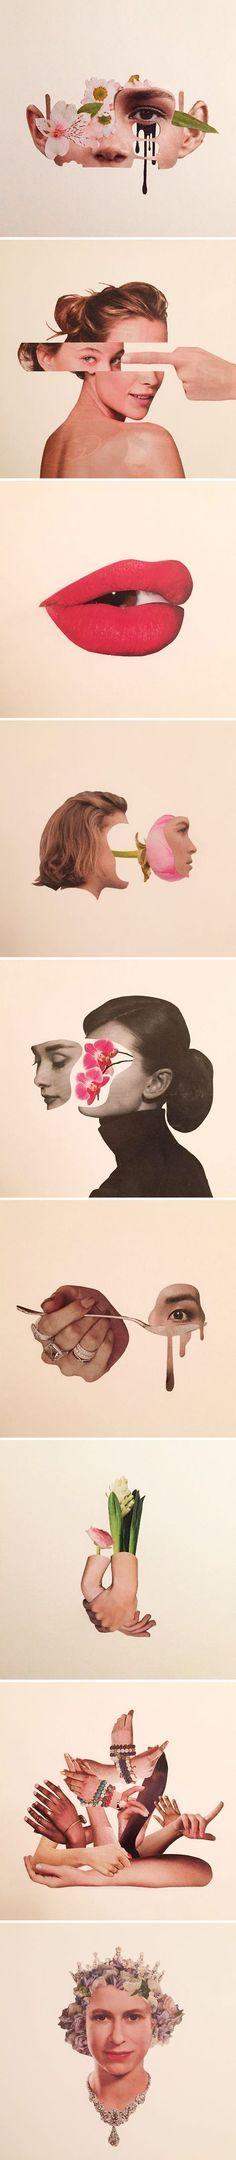 hand-cut collages by adam hale aka mr.splice